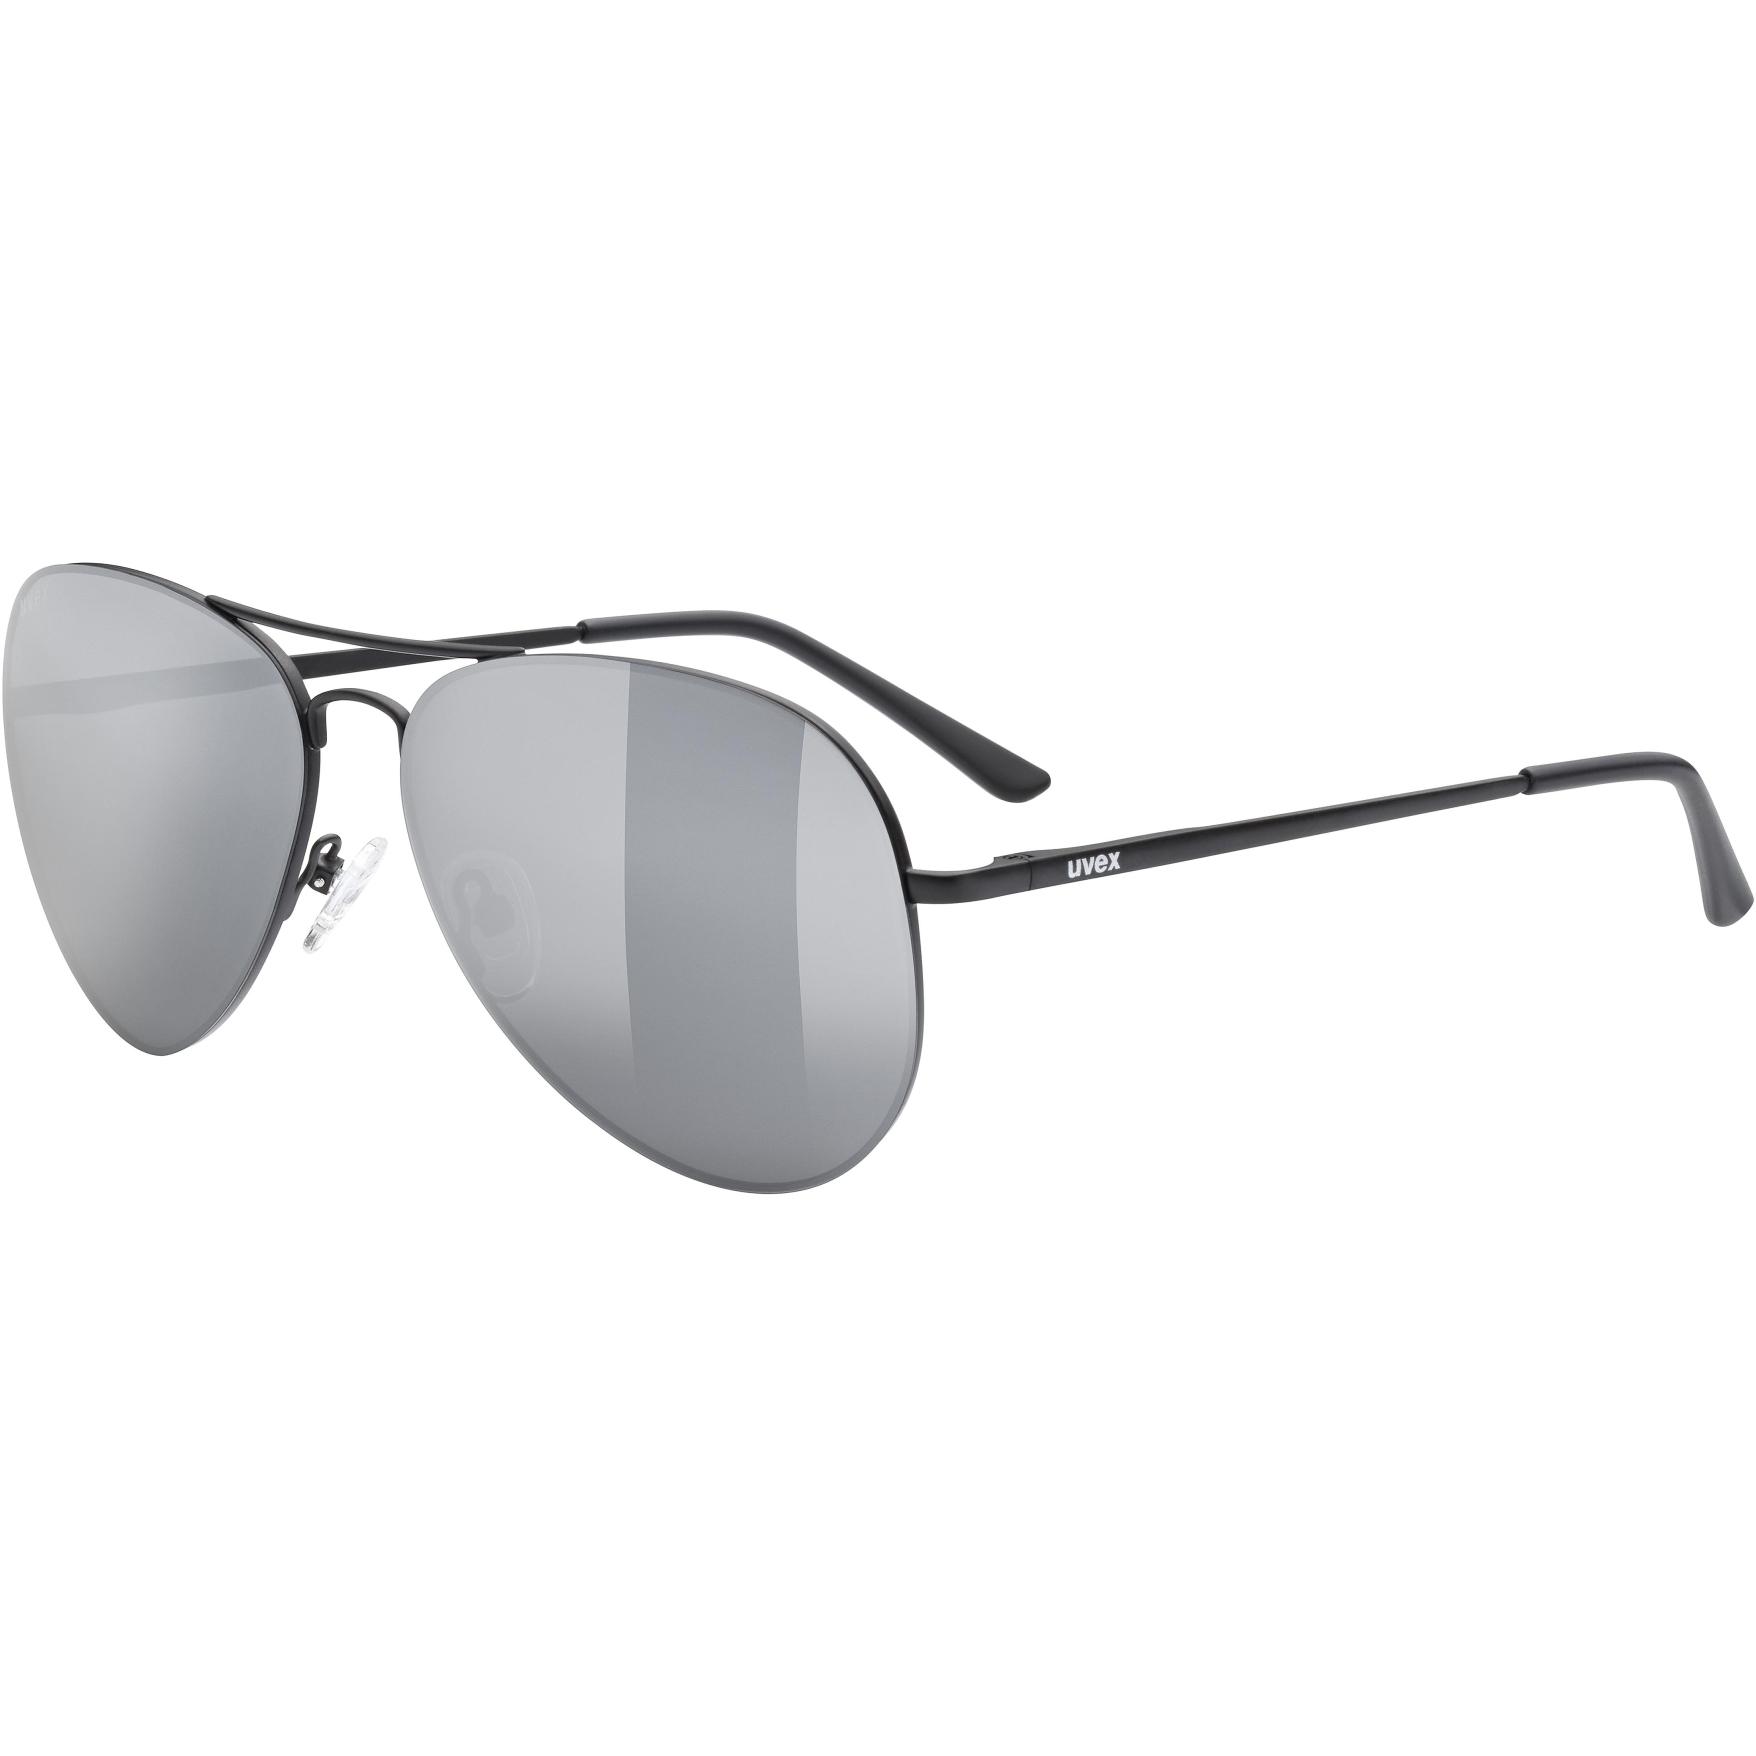 Image of Uvex lgl 45 Glasses - black mat/mirror silver